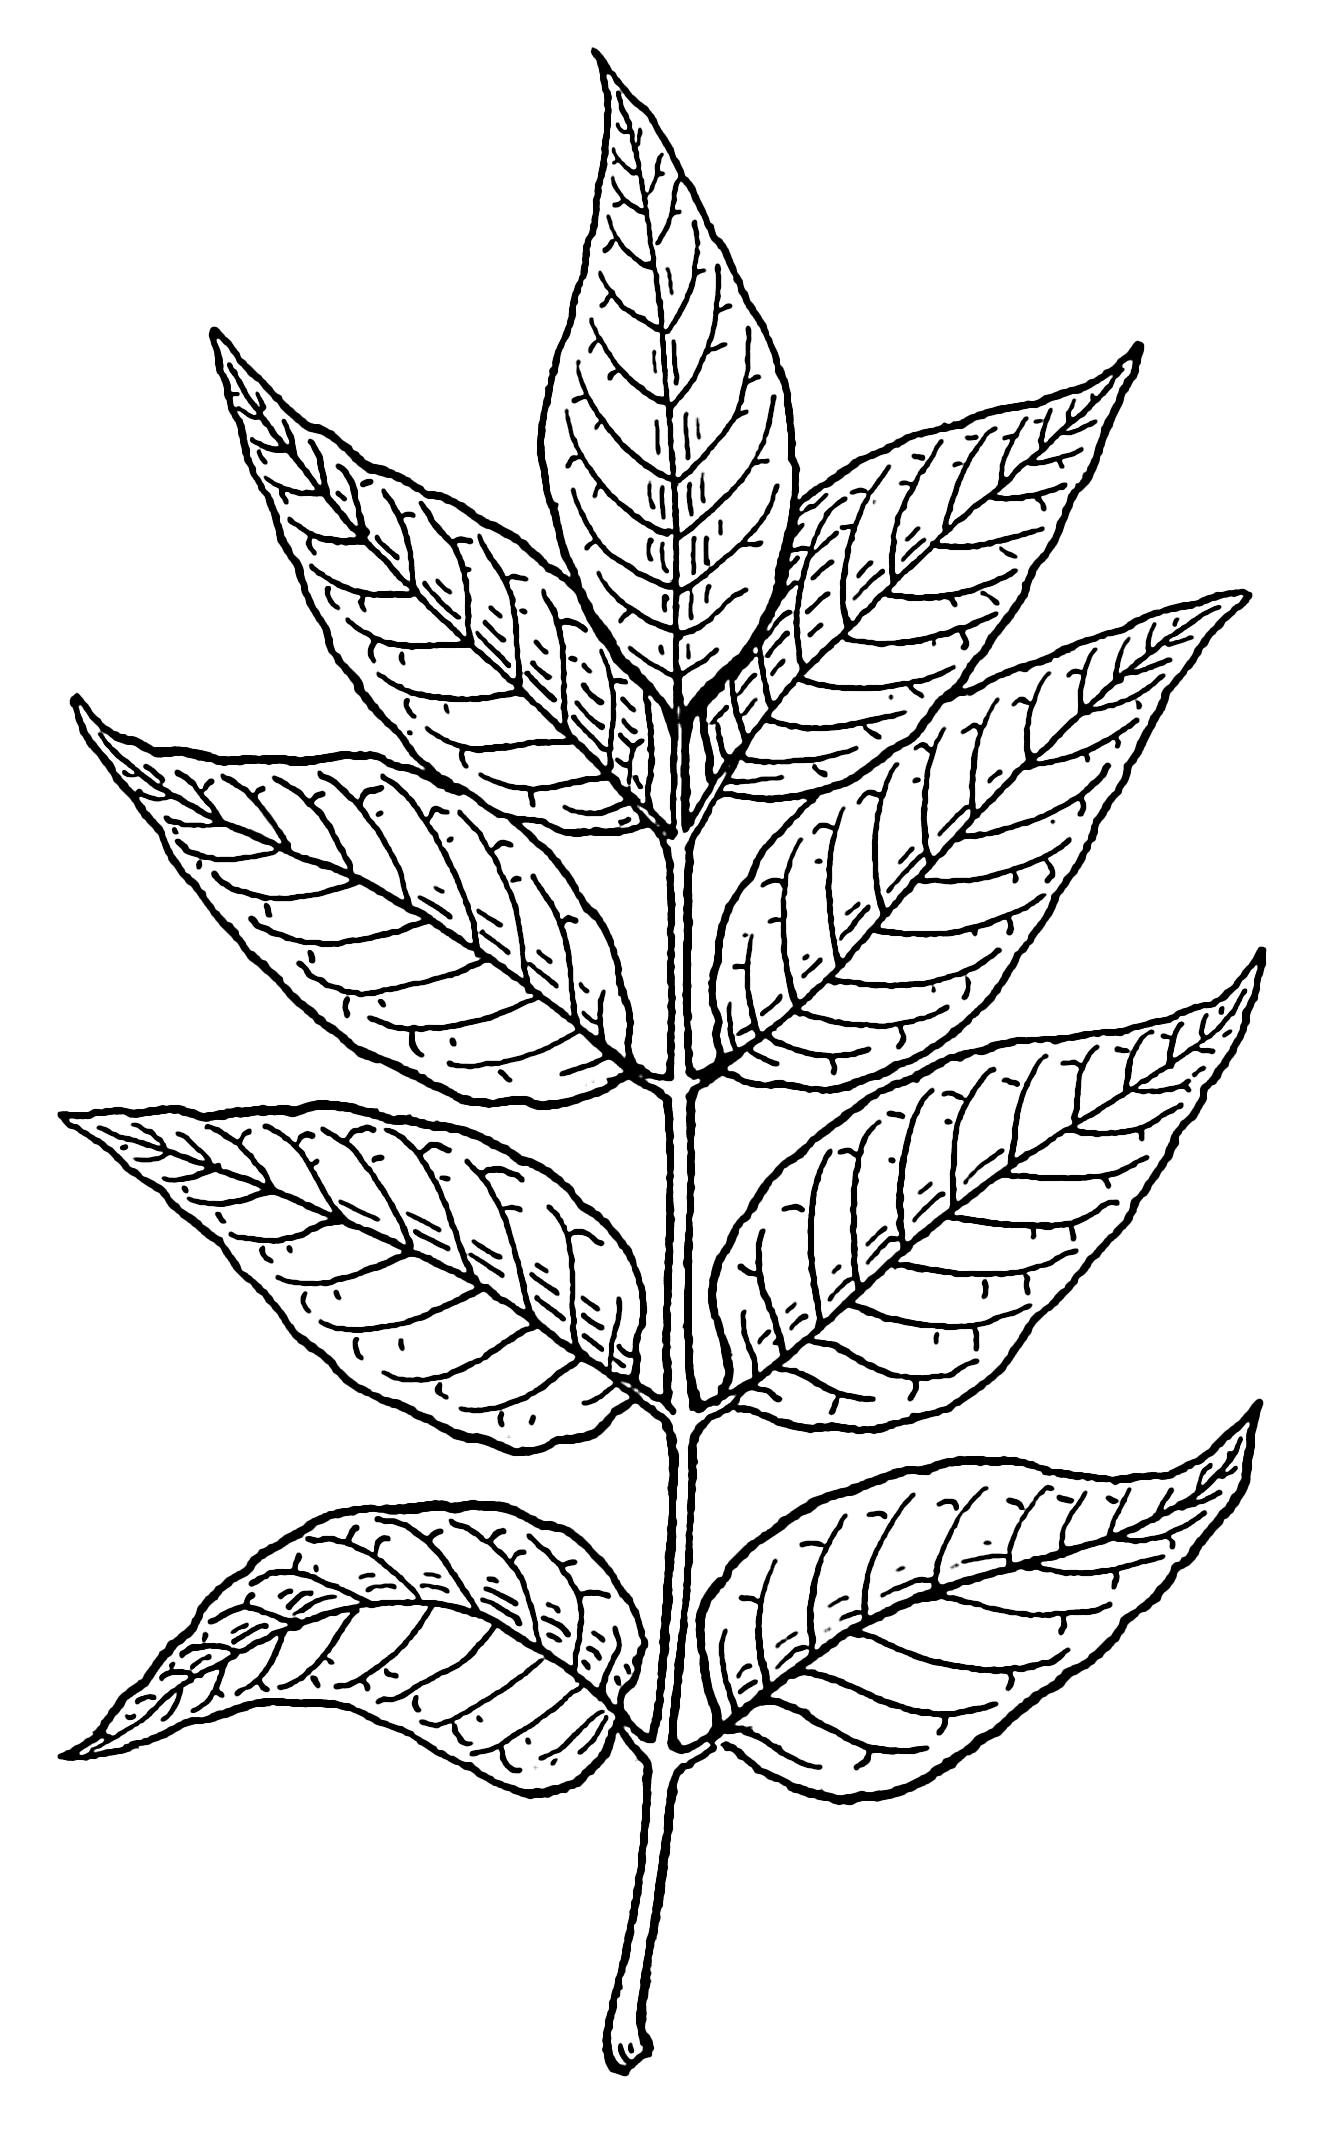 Line Art Leaf : Drawings of leaves sketches description ash psf